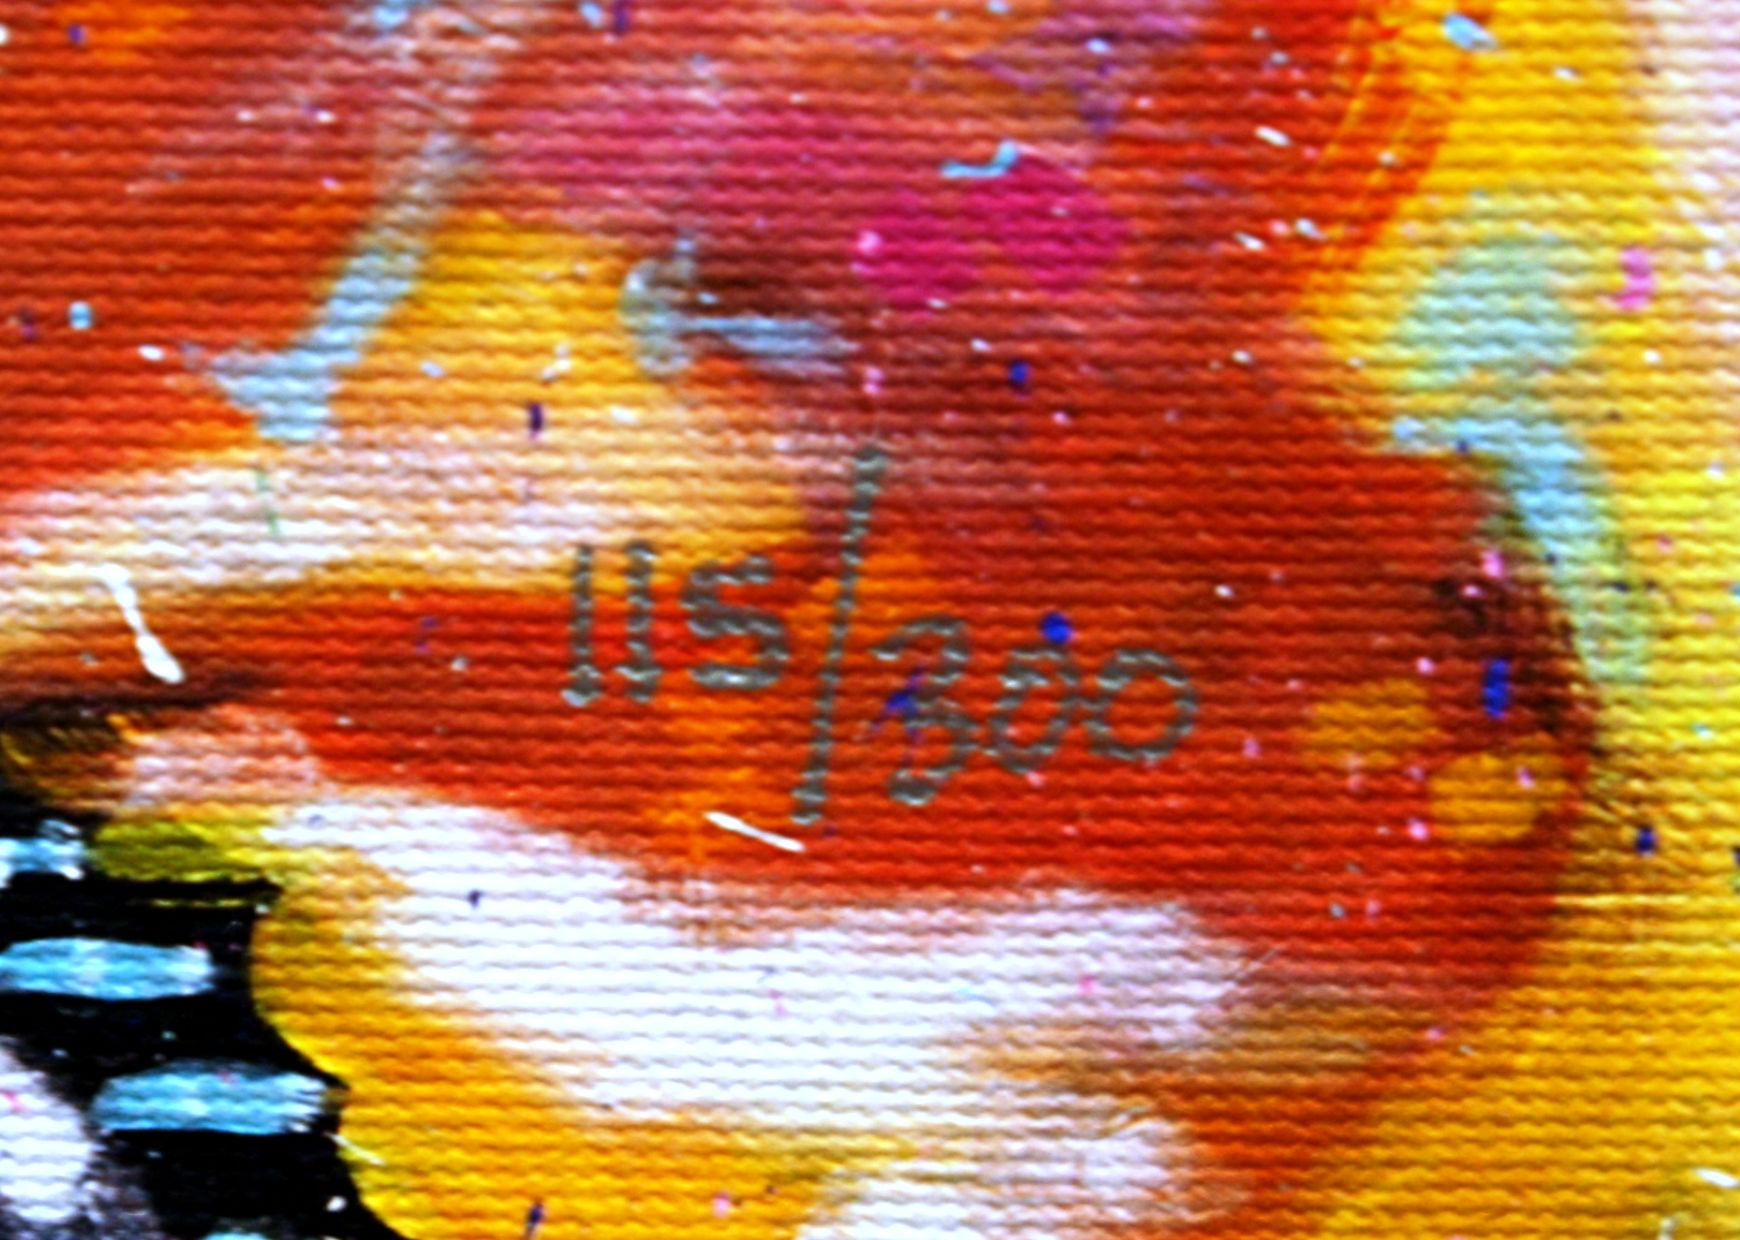 ART6: JIMI HENDRIX #115/300